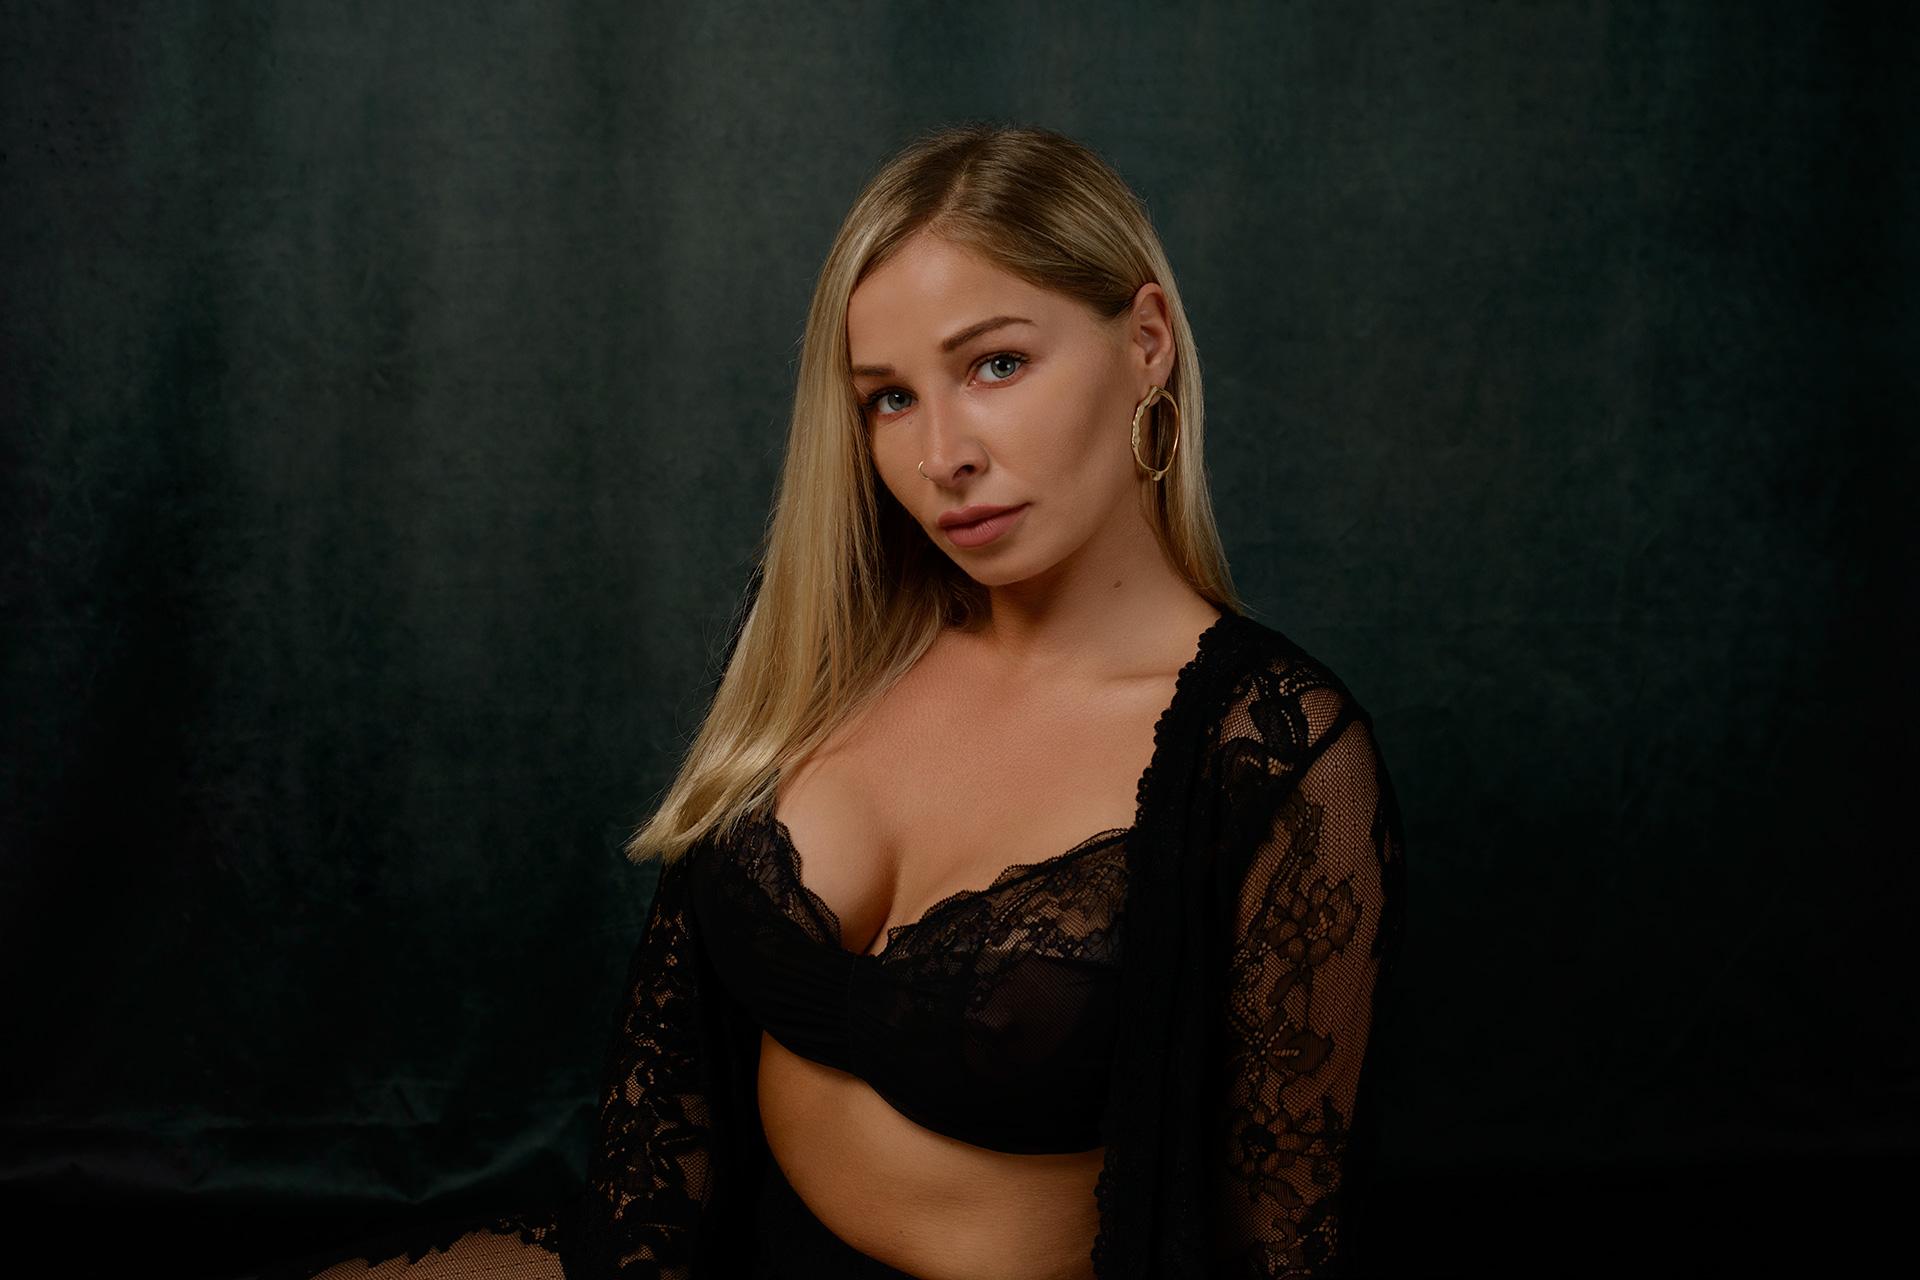 Tanja Model